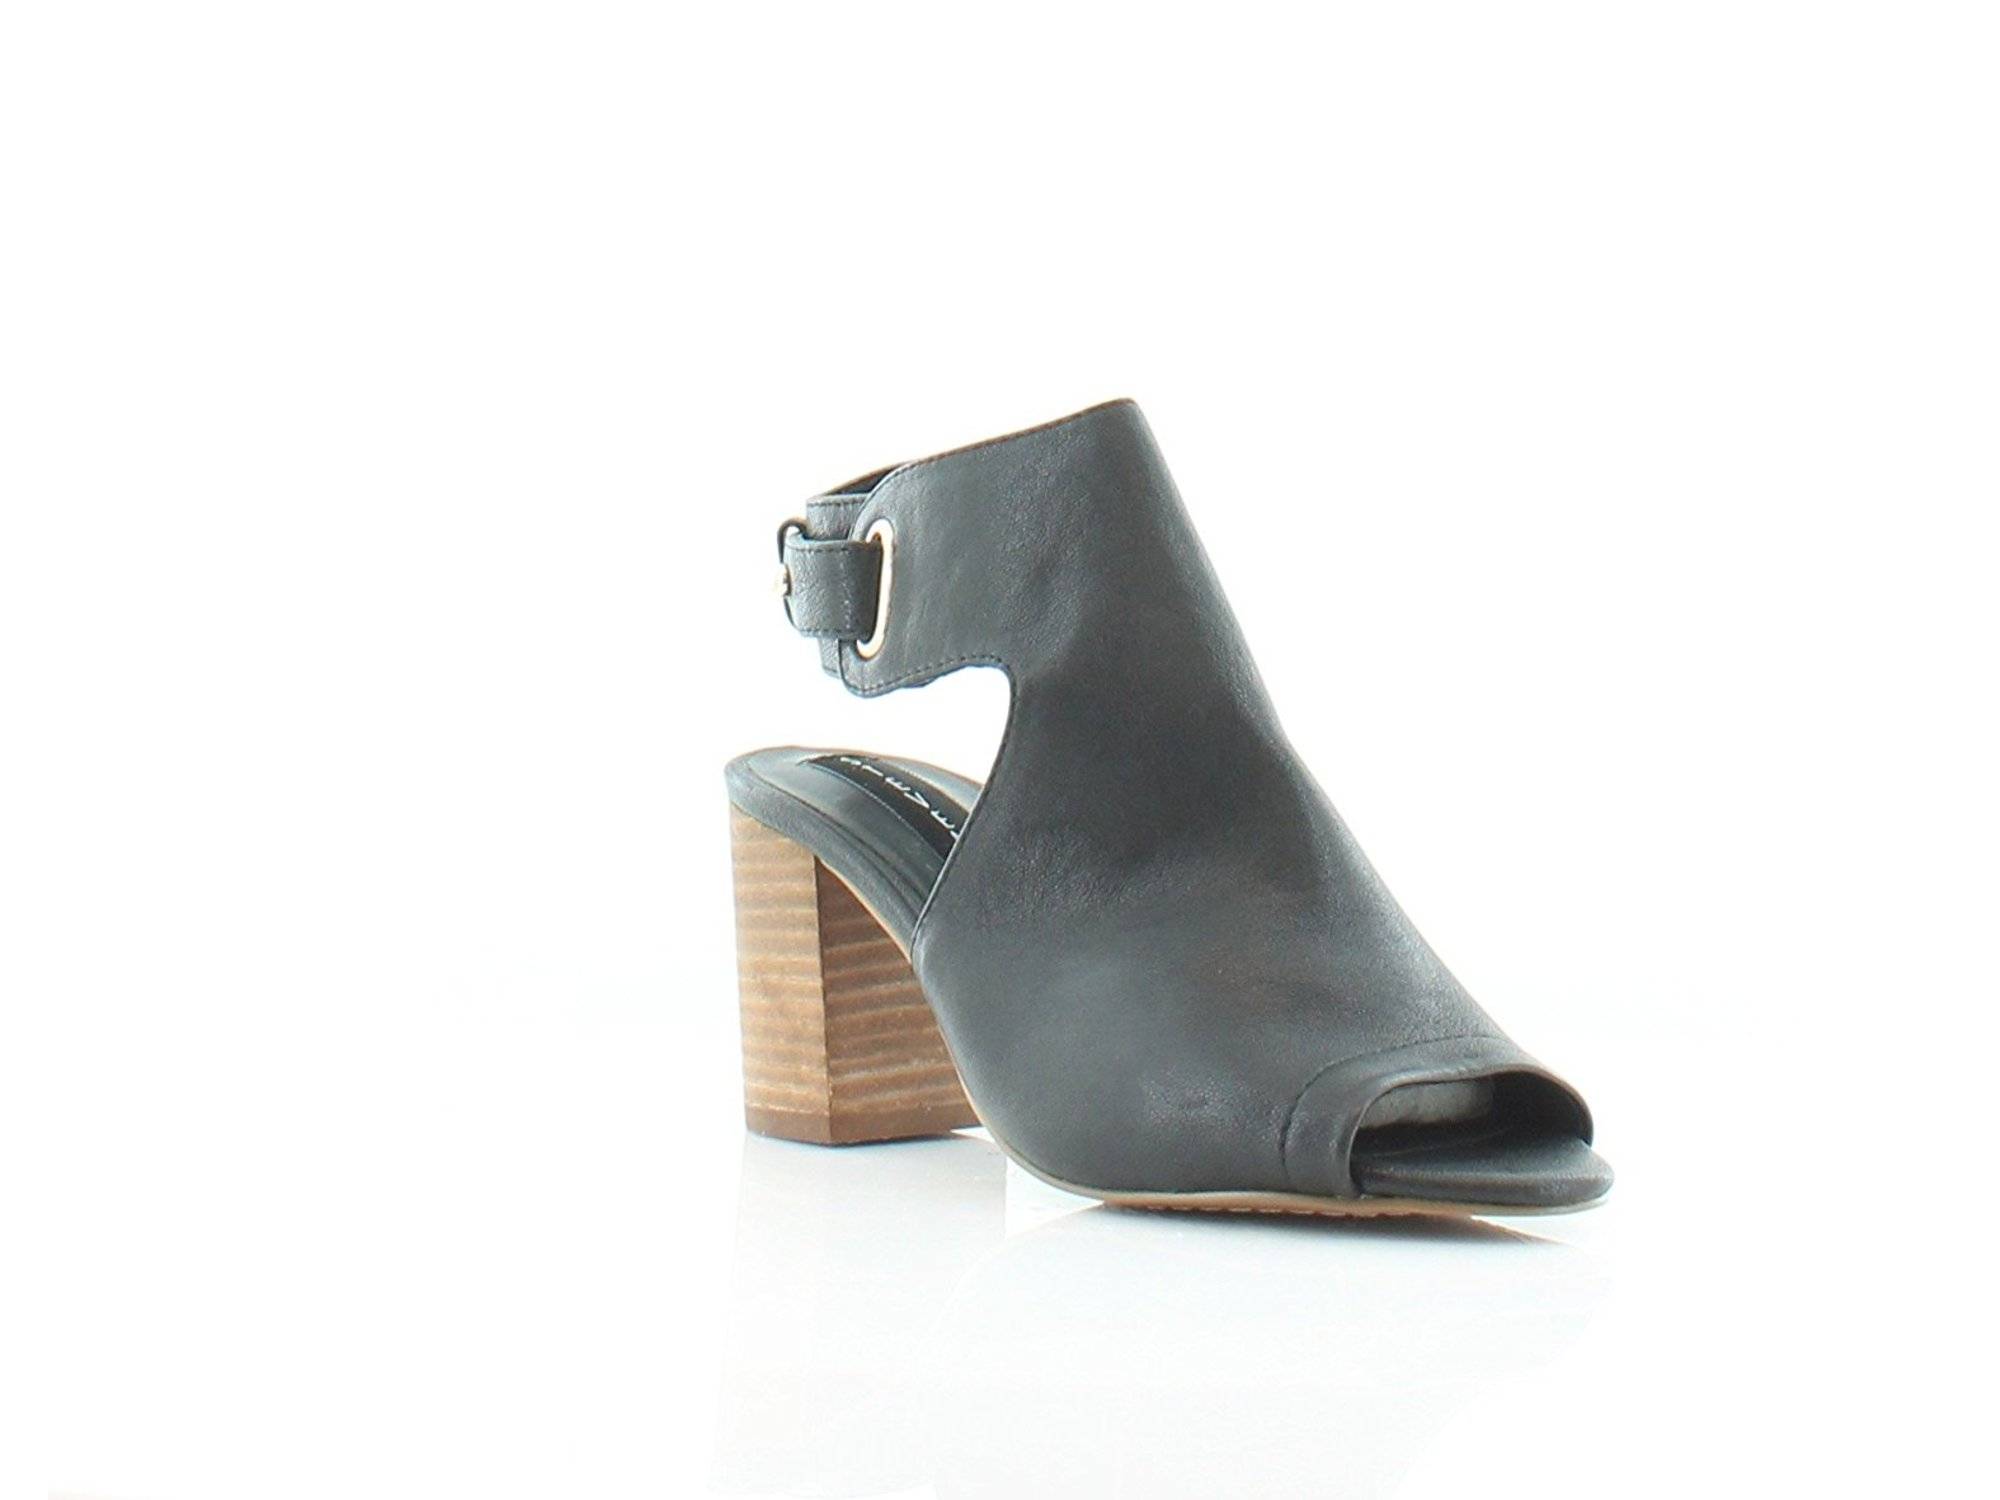 b61a6fe574f STEVEN by Steve Madden Womens Venuz Leather Open Toe, Black Leather, Size  7.0